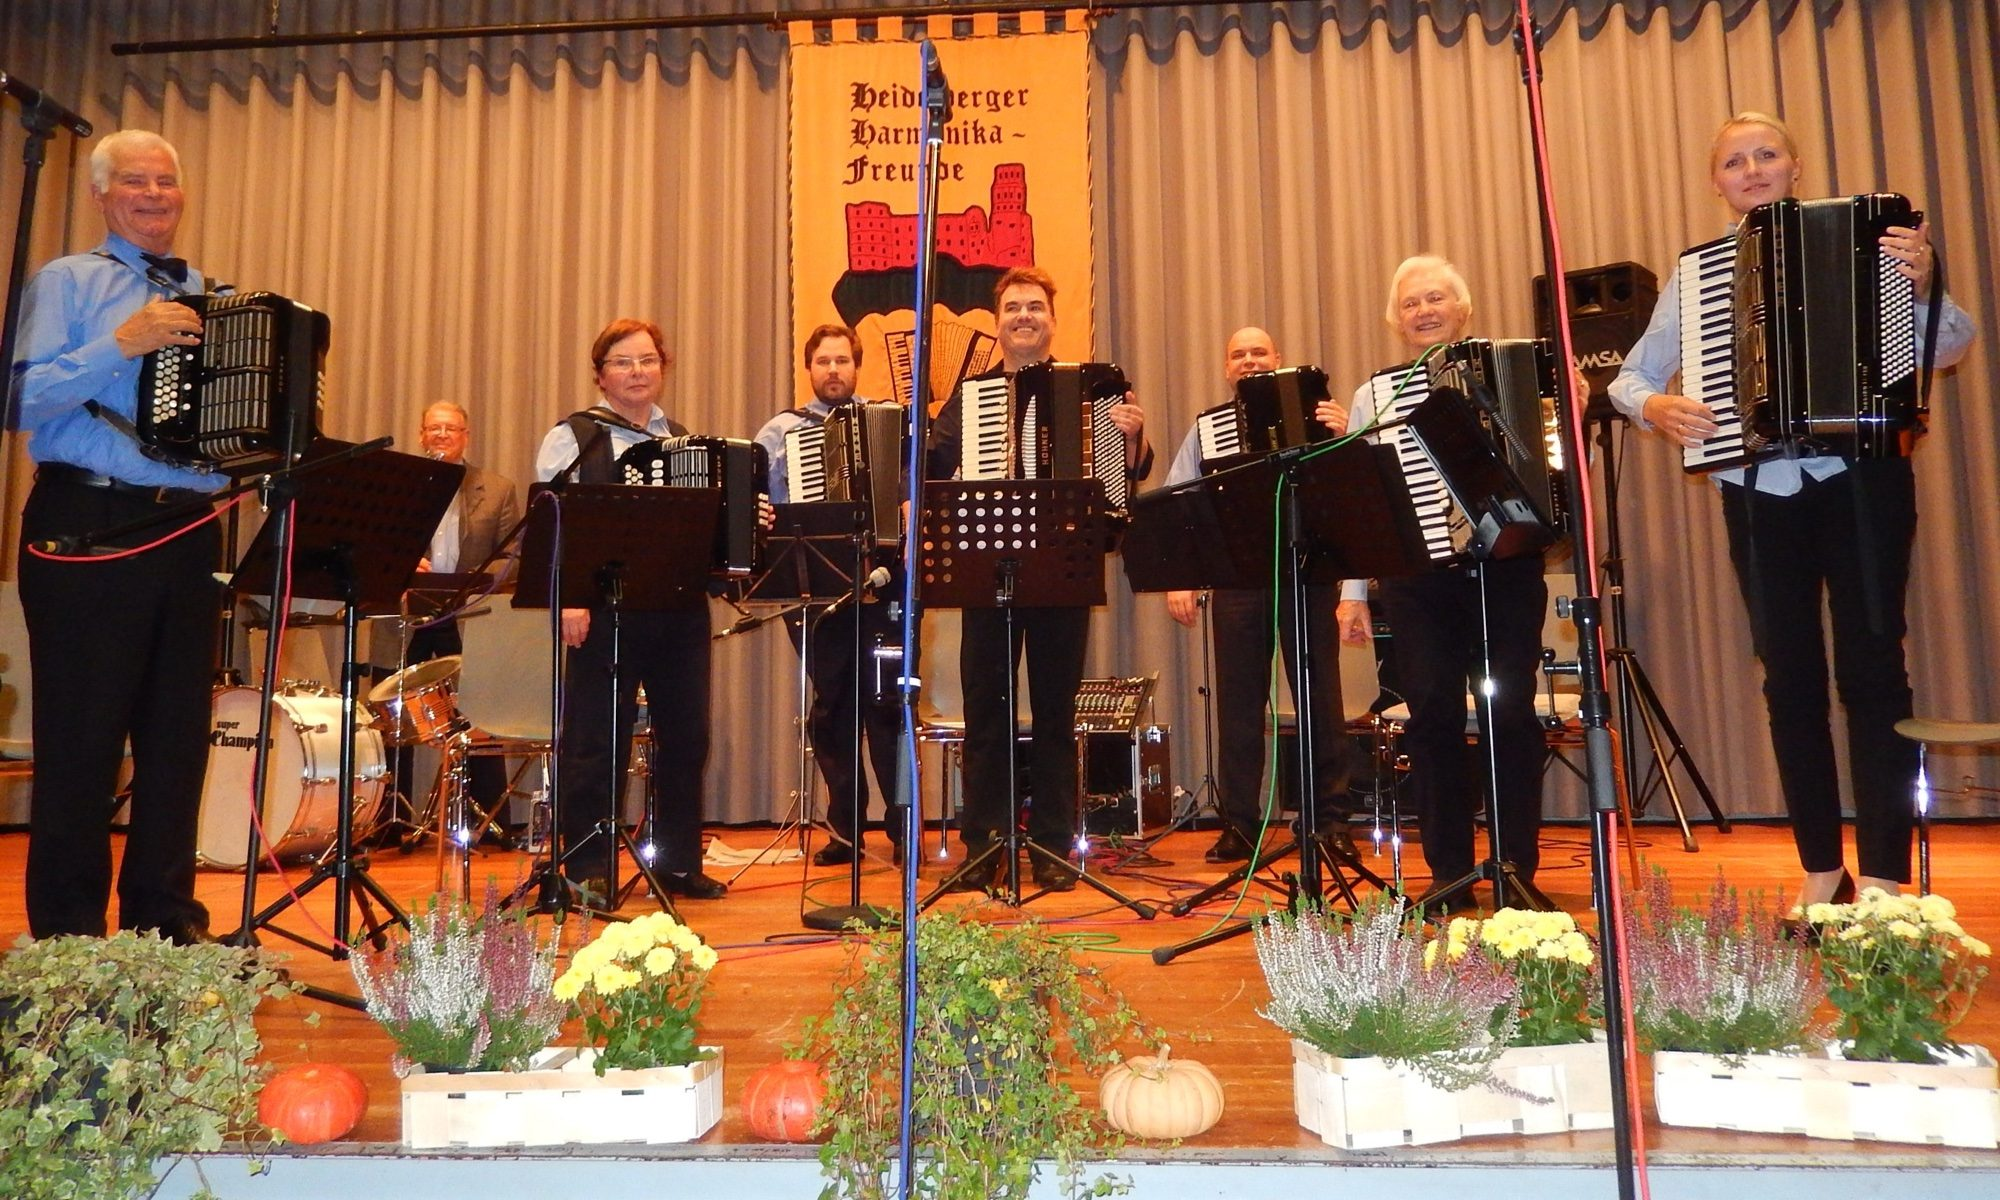 Heidelberger Harmonika-Freunde e.V.